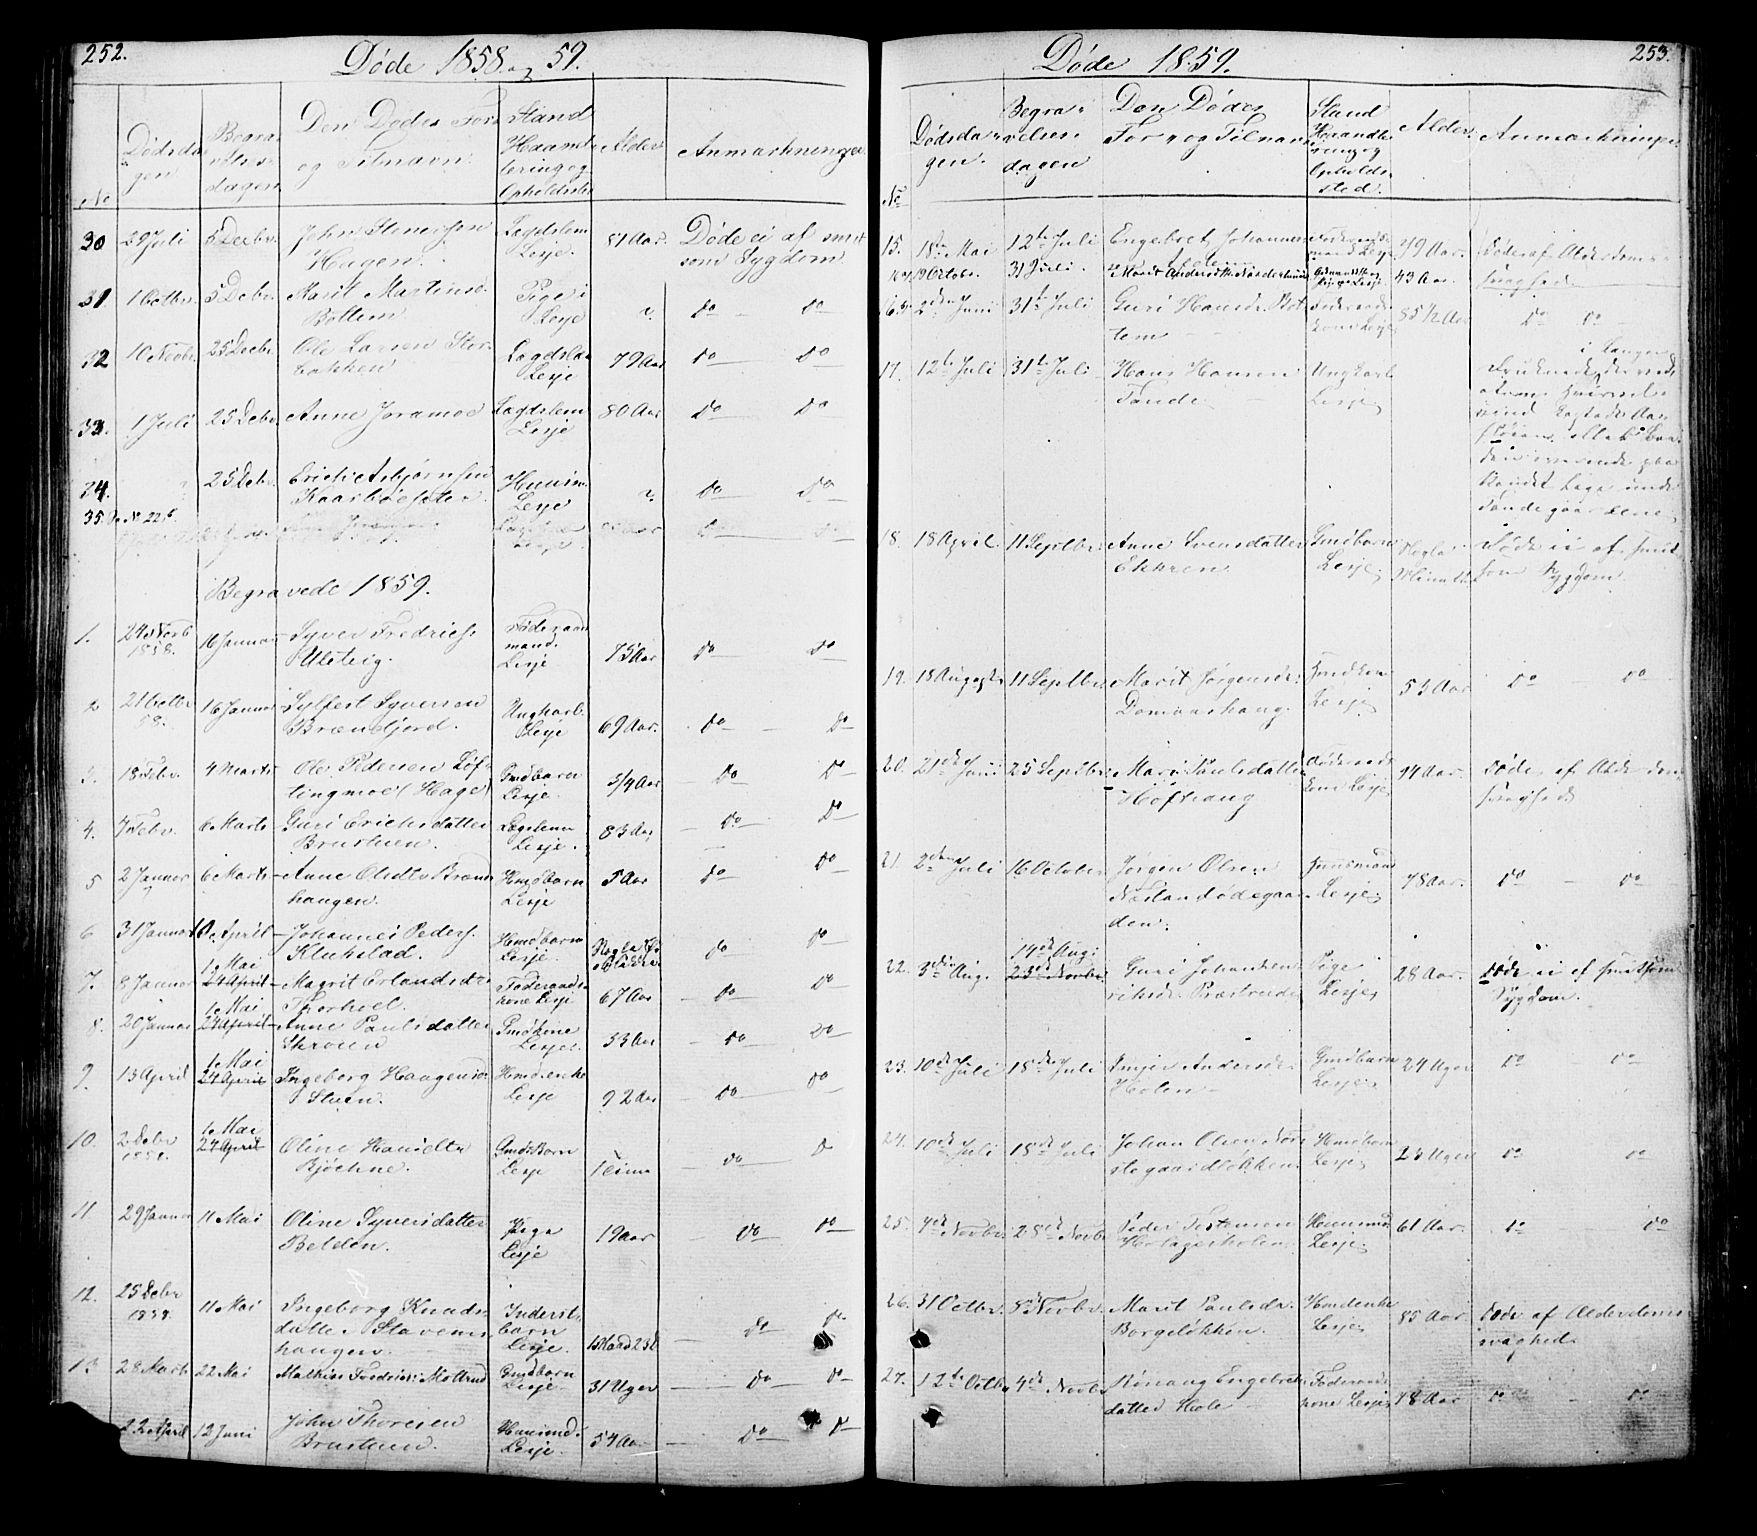 SAH, Lesja prestekontor, Klokkerbok nr. 5, 1850-1894, s. 252-253